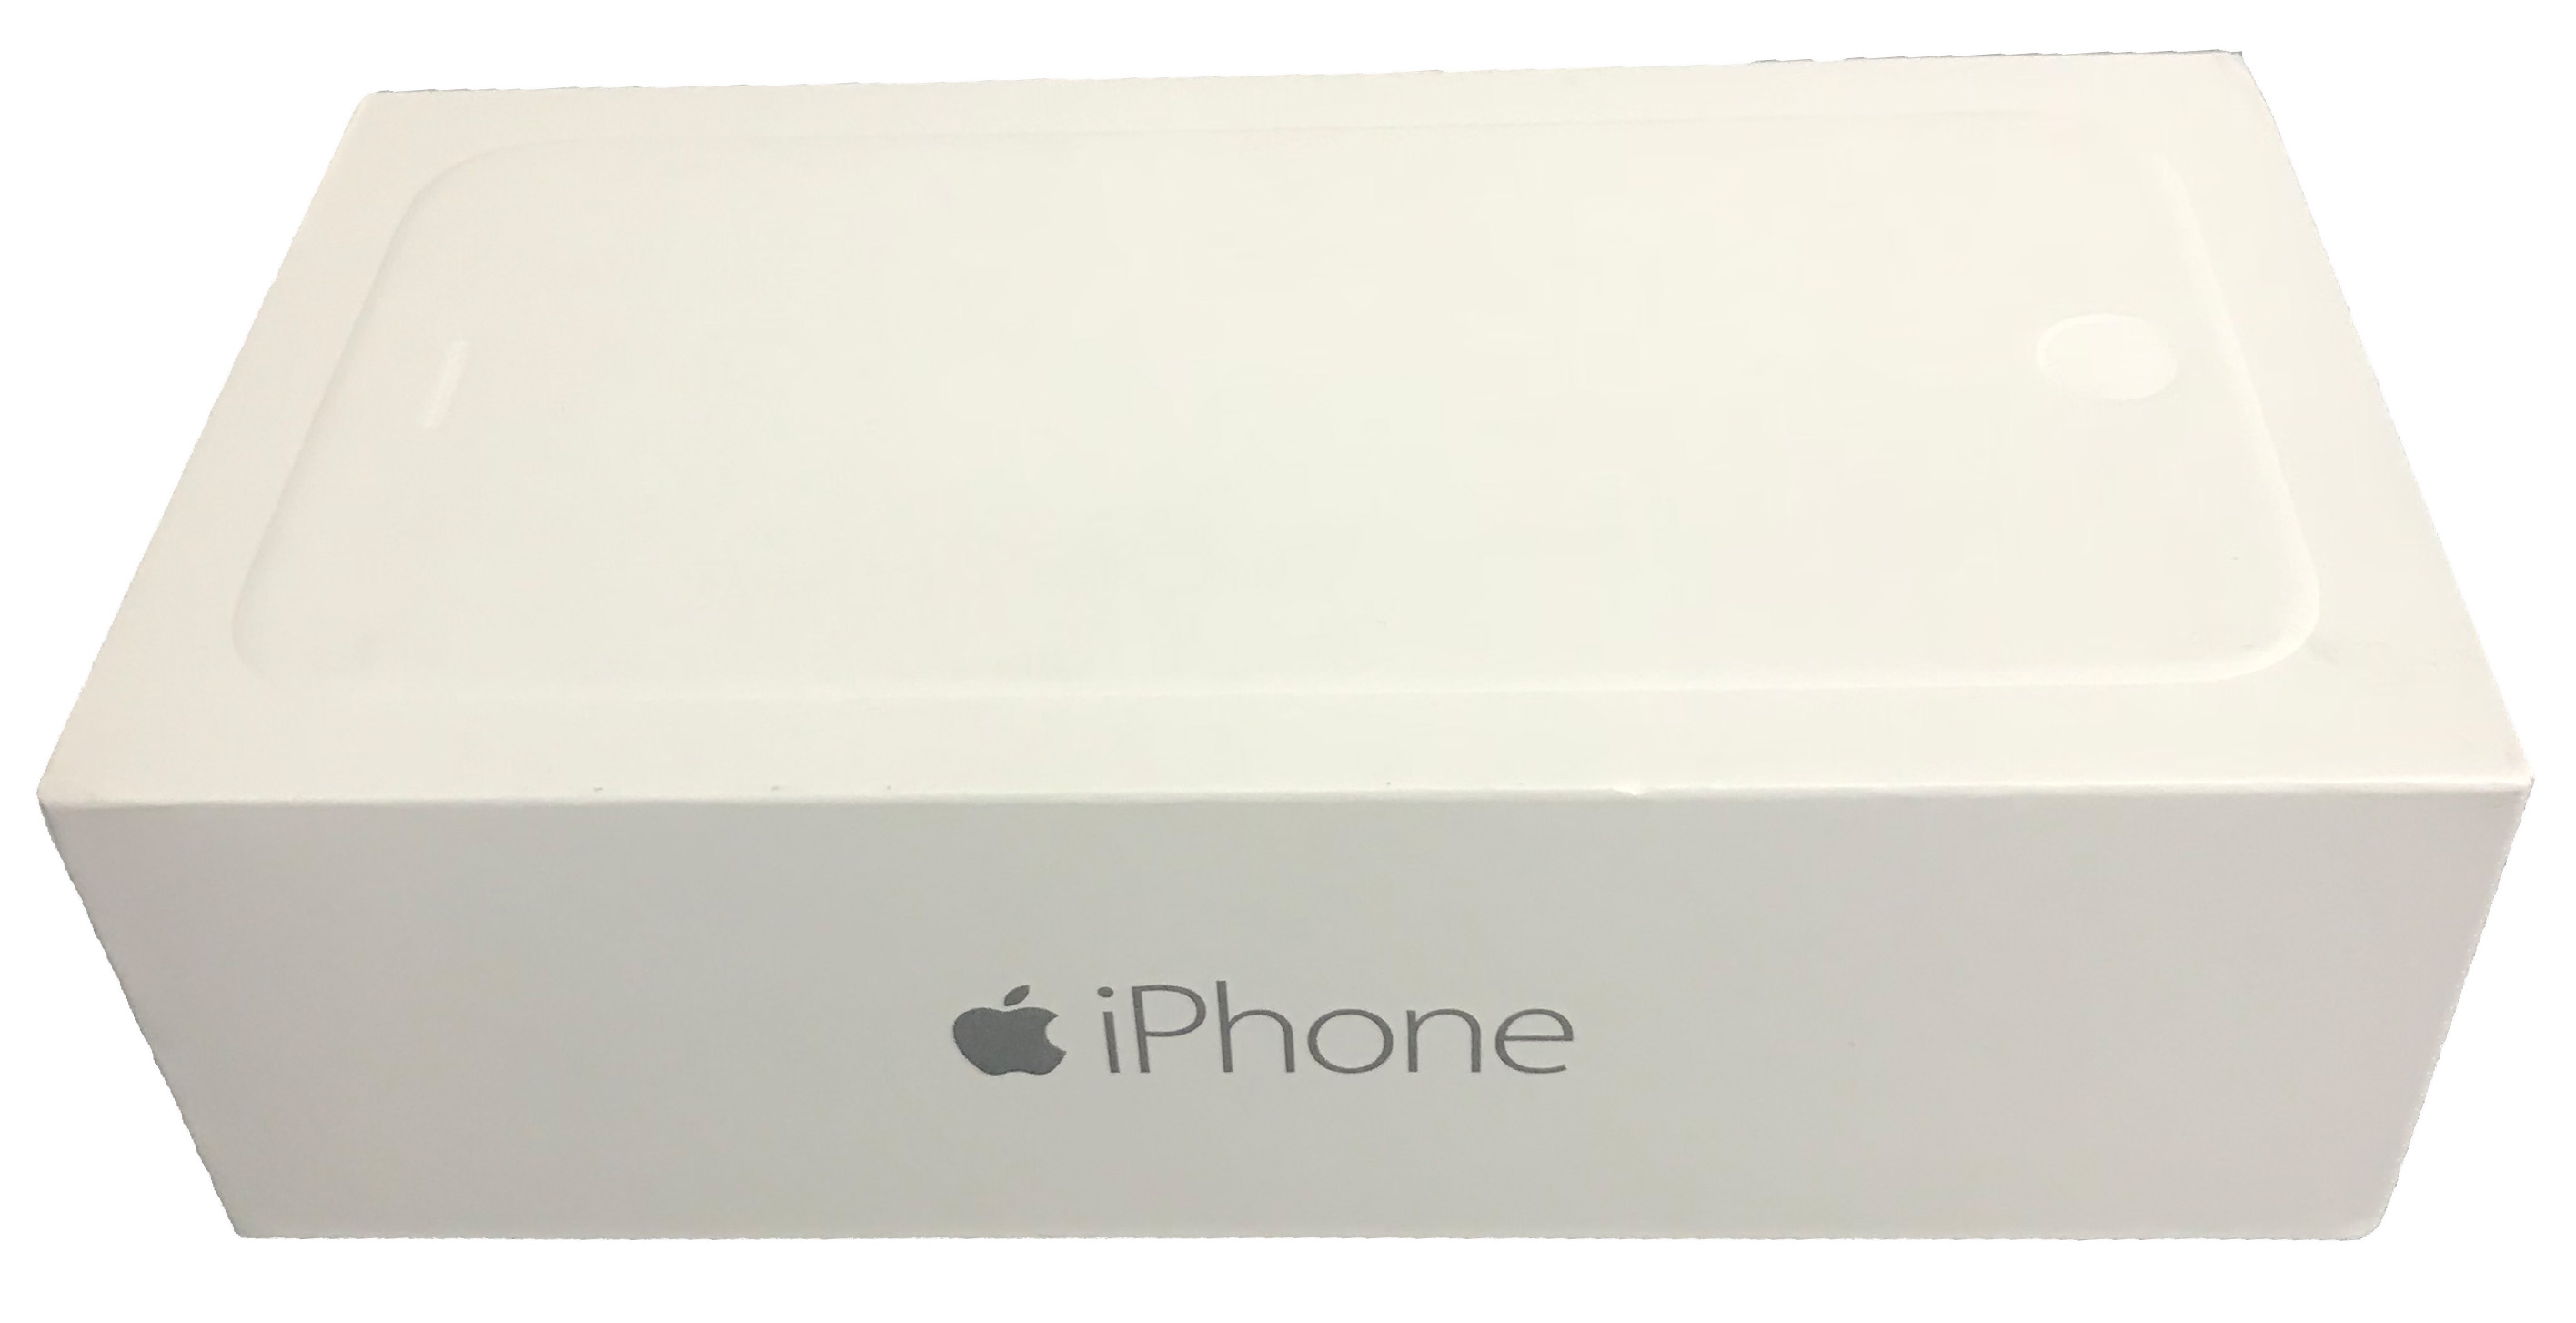 apple iphone 6 silber spacegrau gold 16 gb 32 gb 64 gb ohne simlock top ebay. Black Bedroom Furniture Sets. Home Design Ideas